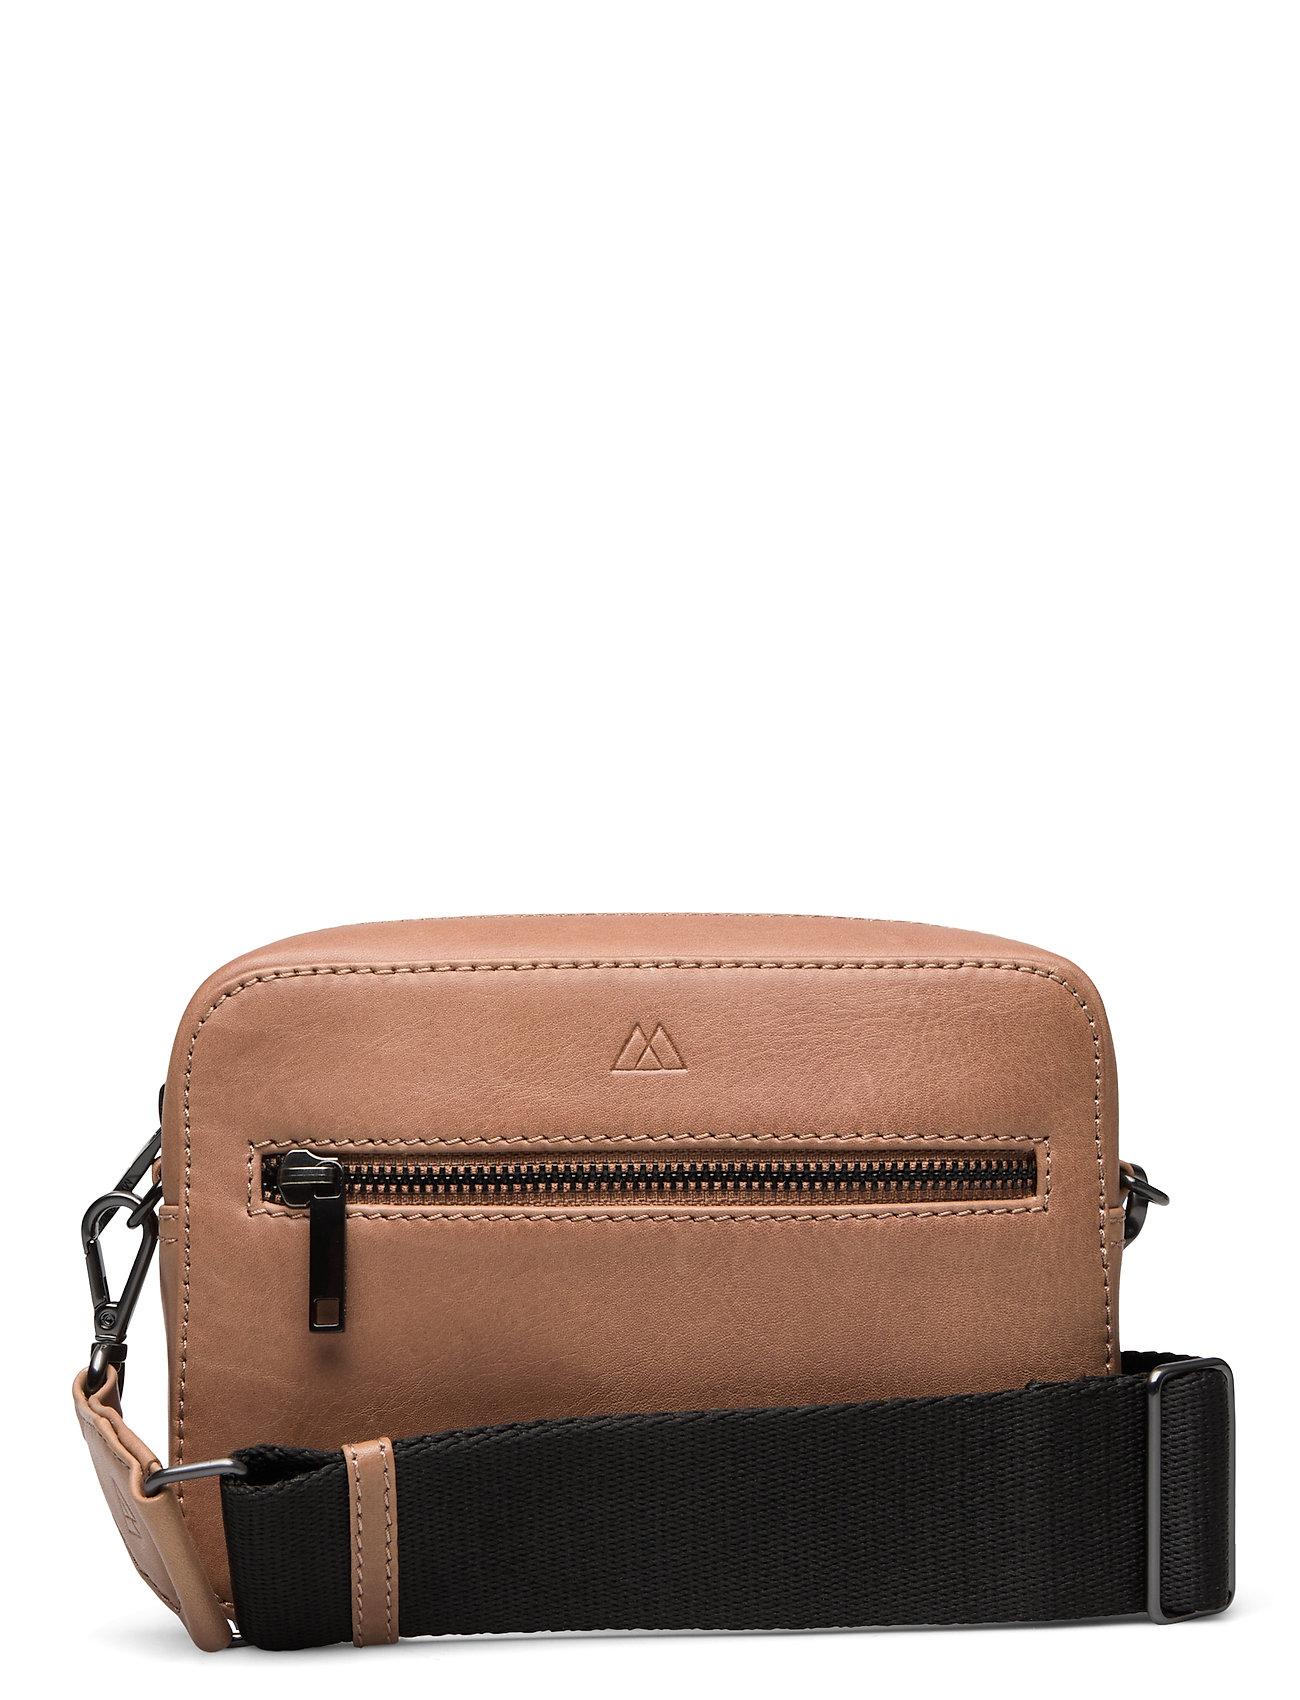 Elea Crossbody Bag, Antique